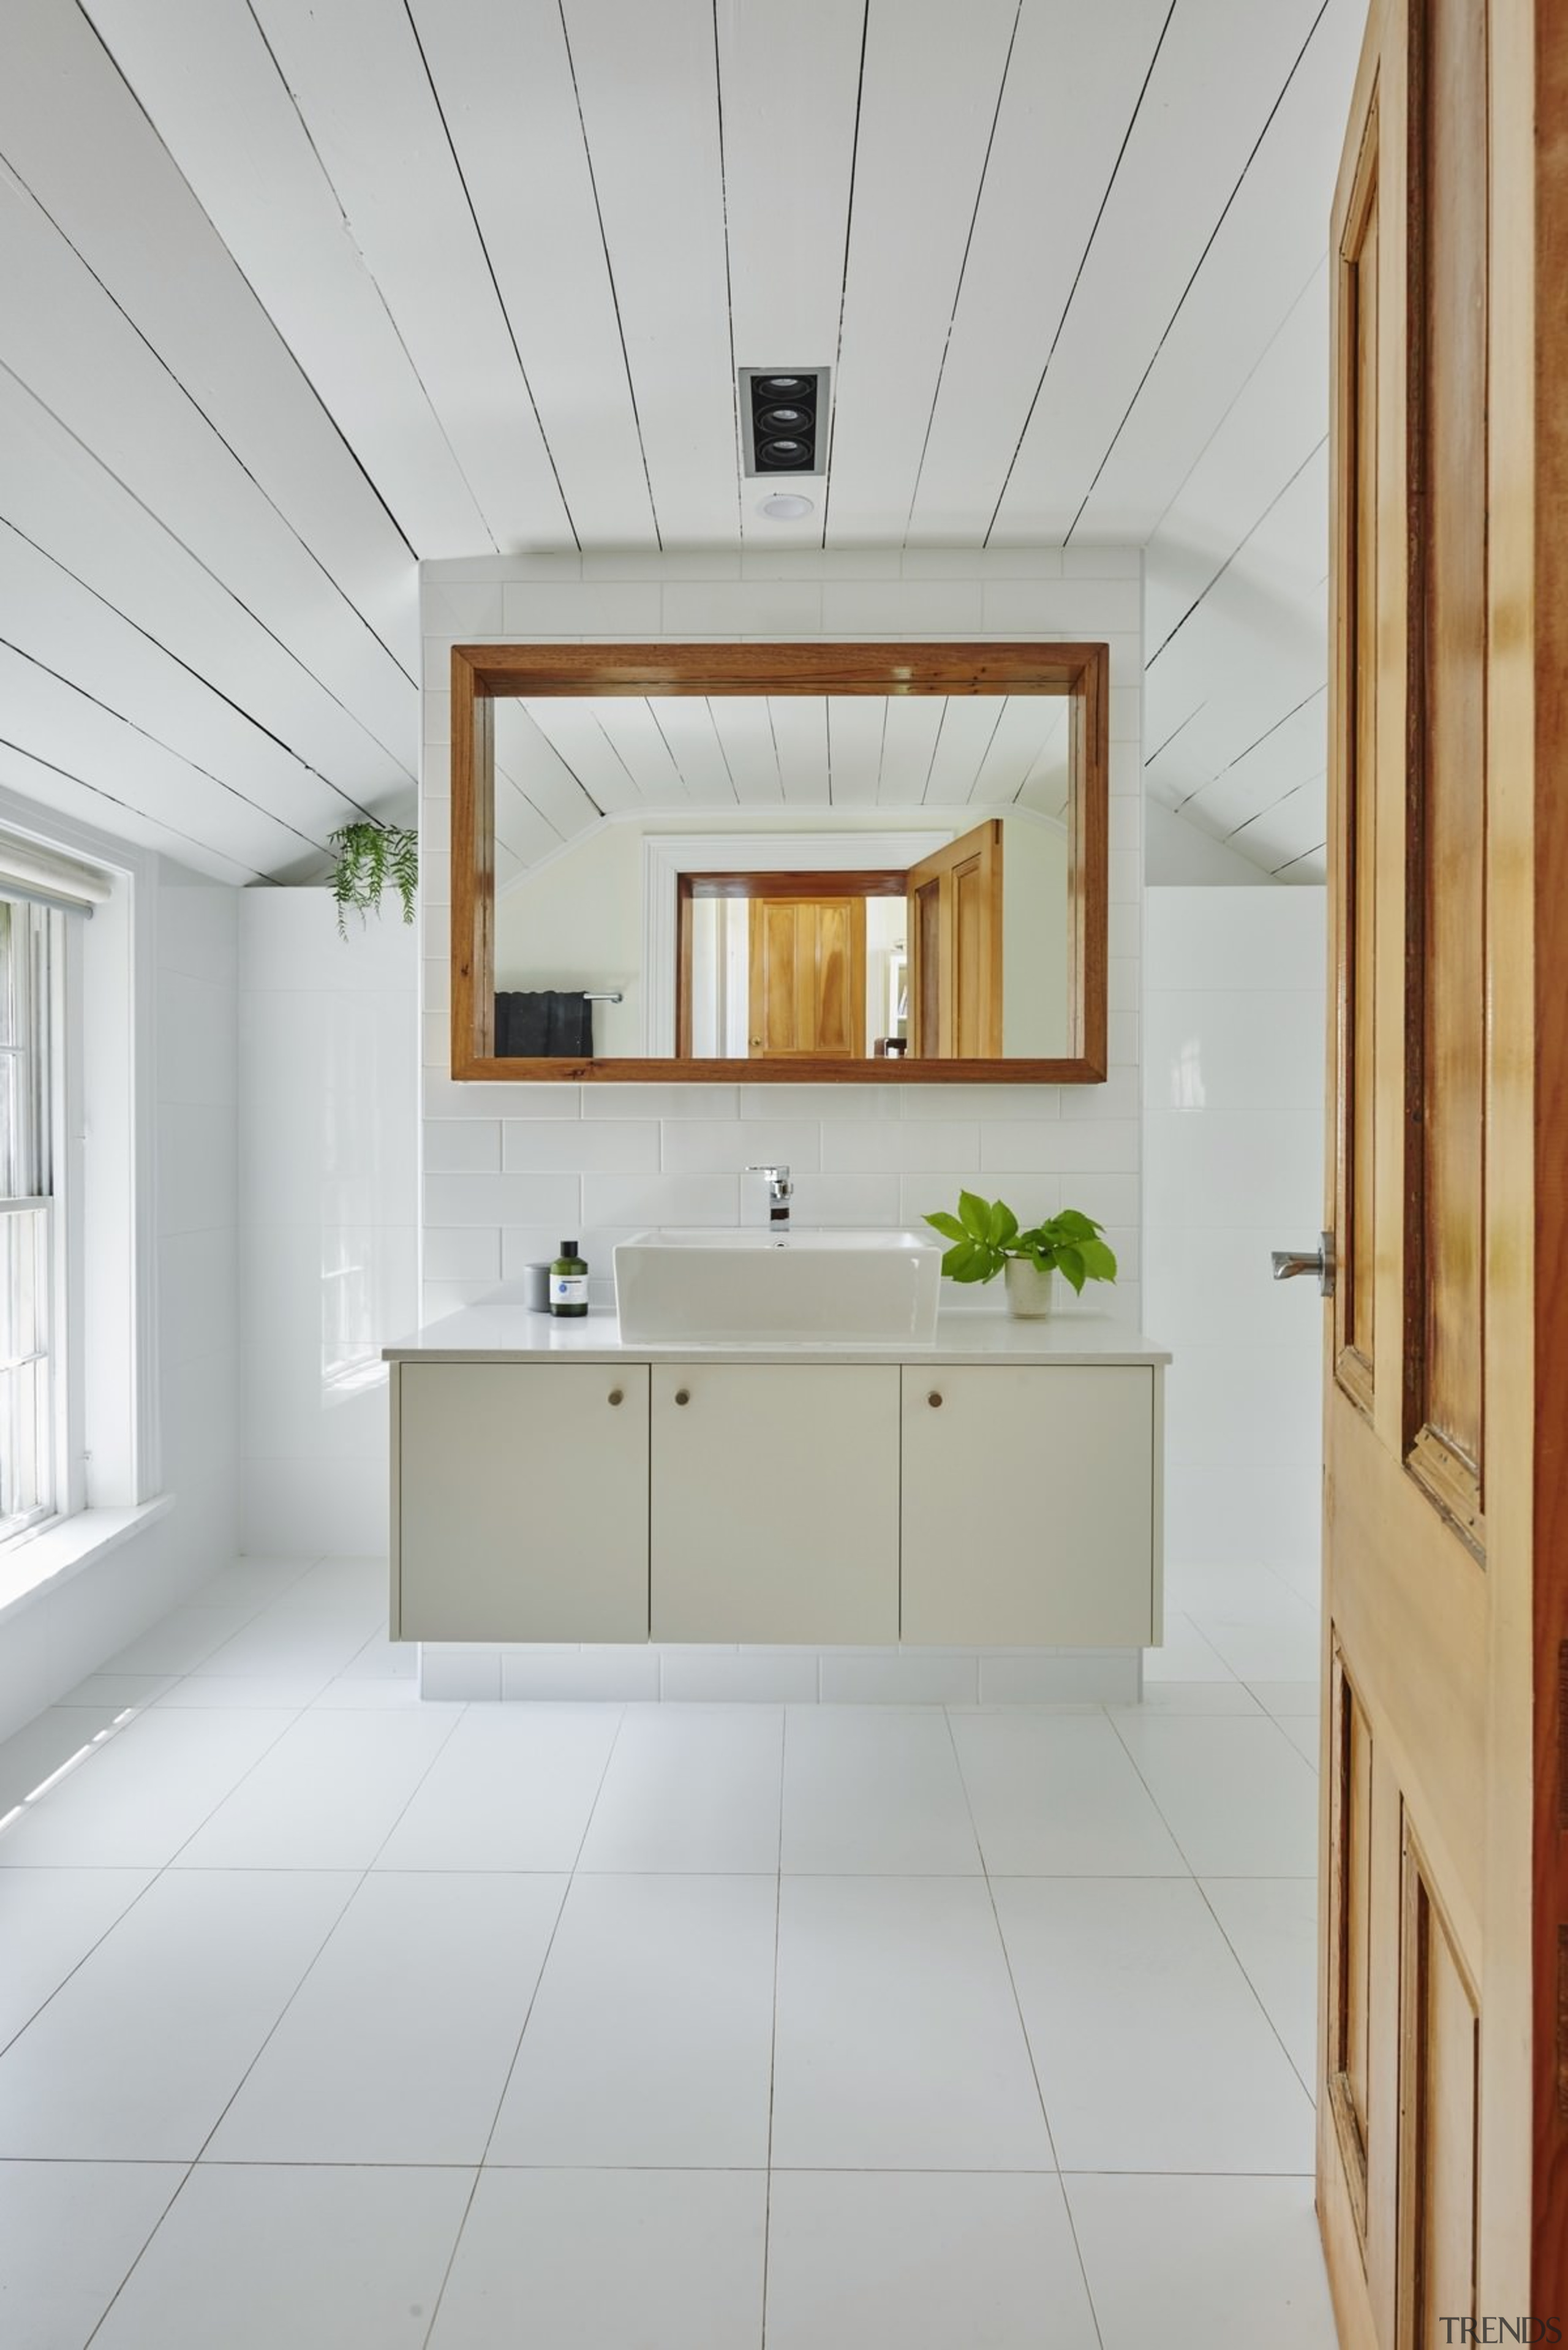 The bathroom vanity floats above the floor - architecture, ceiling, floor, flooring, home, interior design, room, window, gray